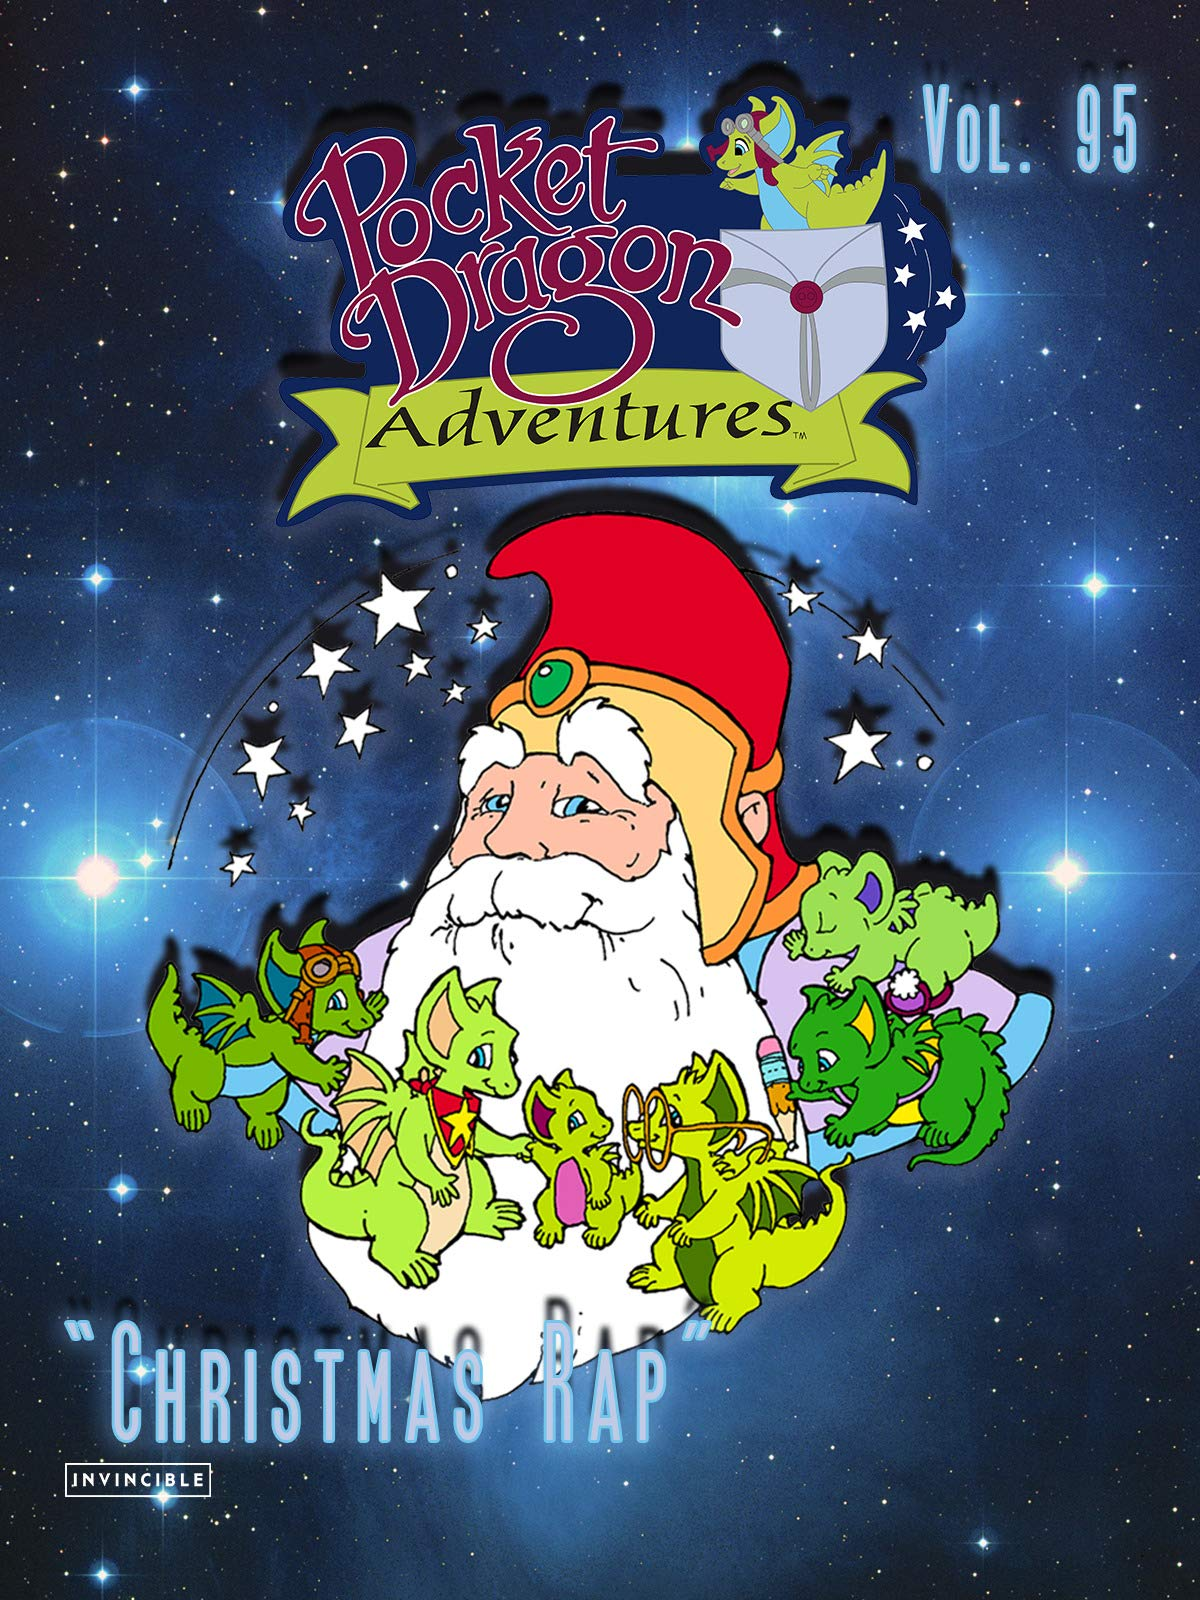 Pocket Dragon Adventures Vol. 95Christmas Rap